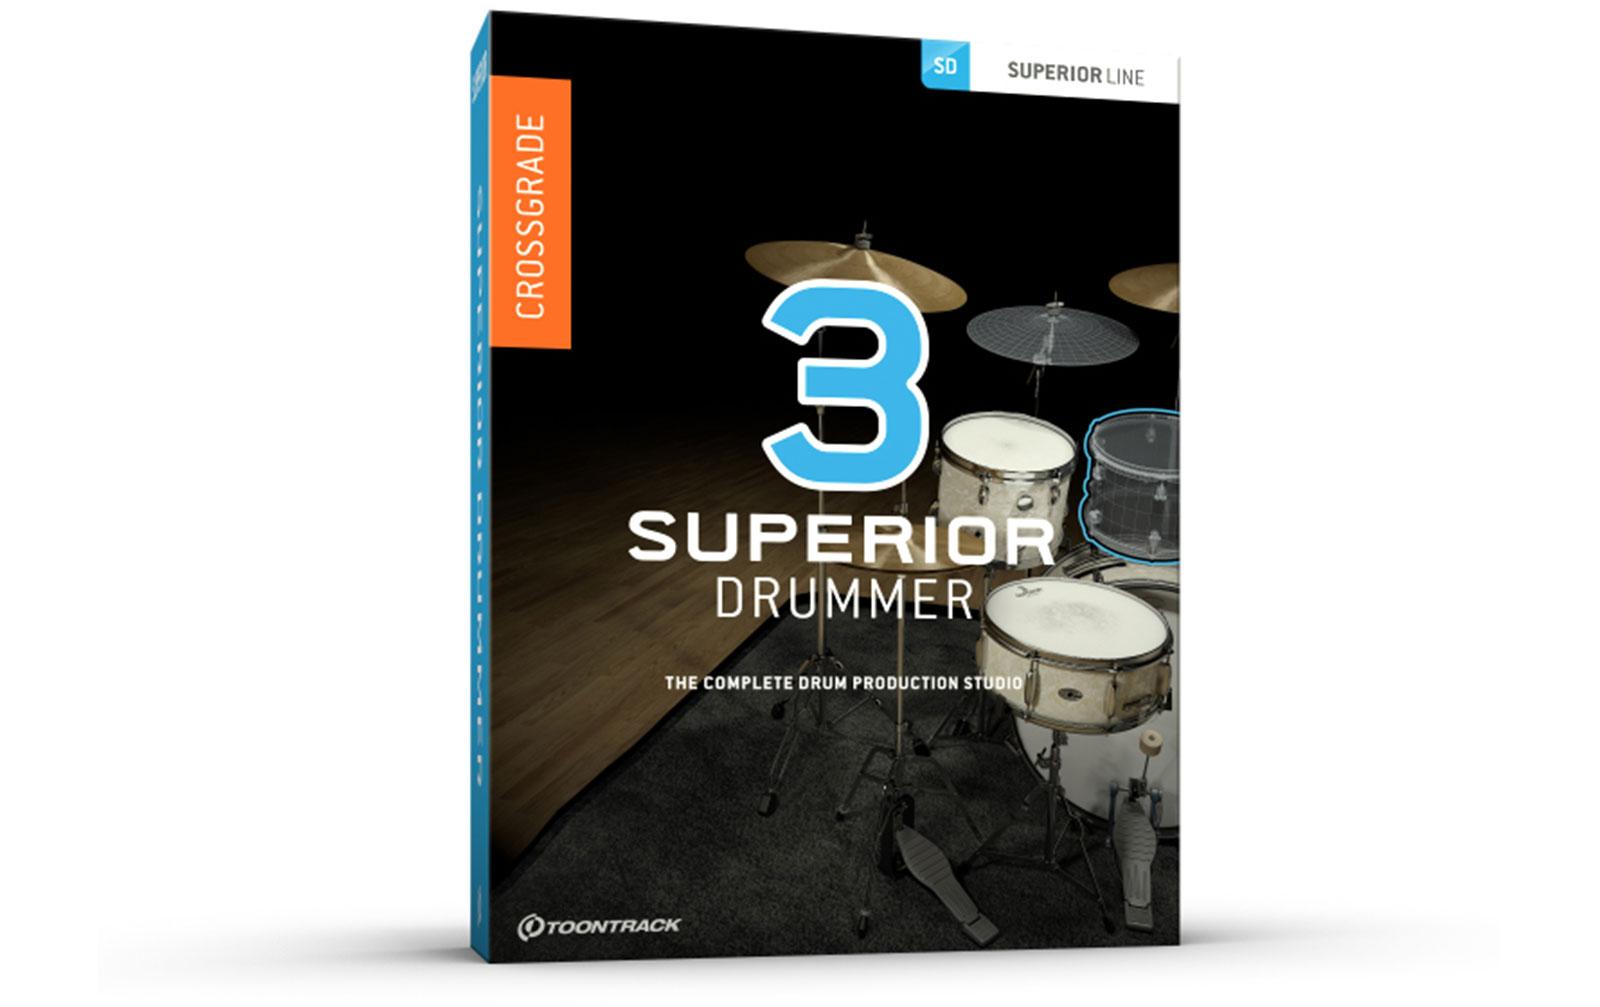 toontrack-superior-drummer-3-crossgrade-von-ezdrummer-2-download-